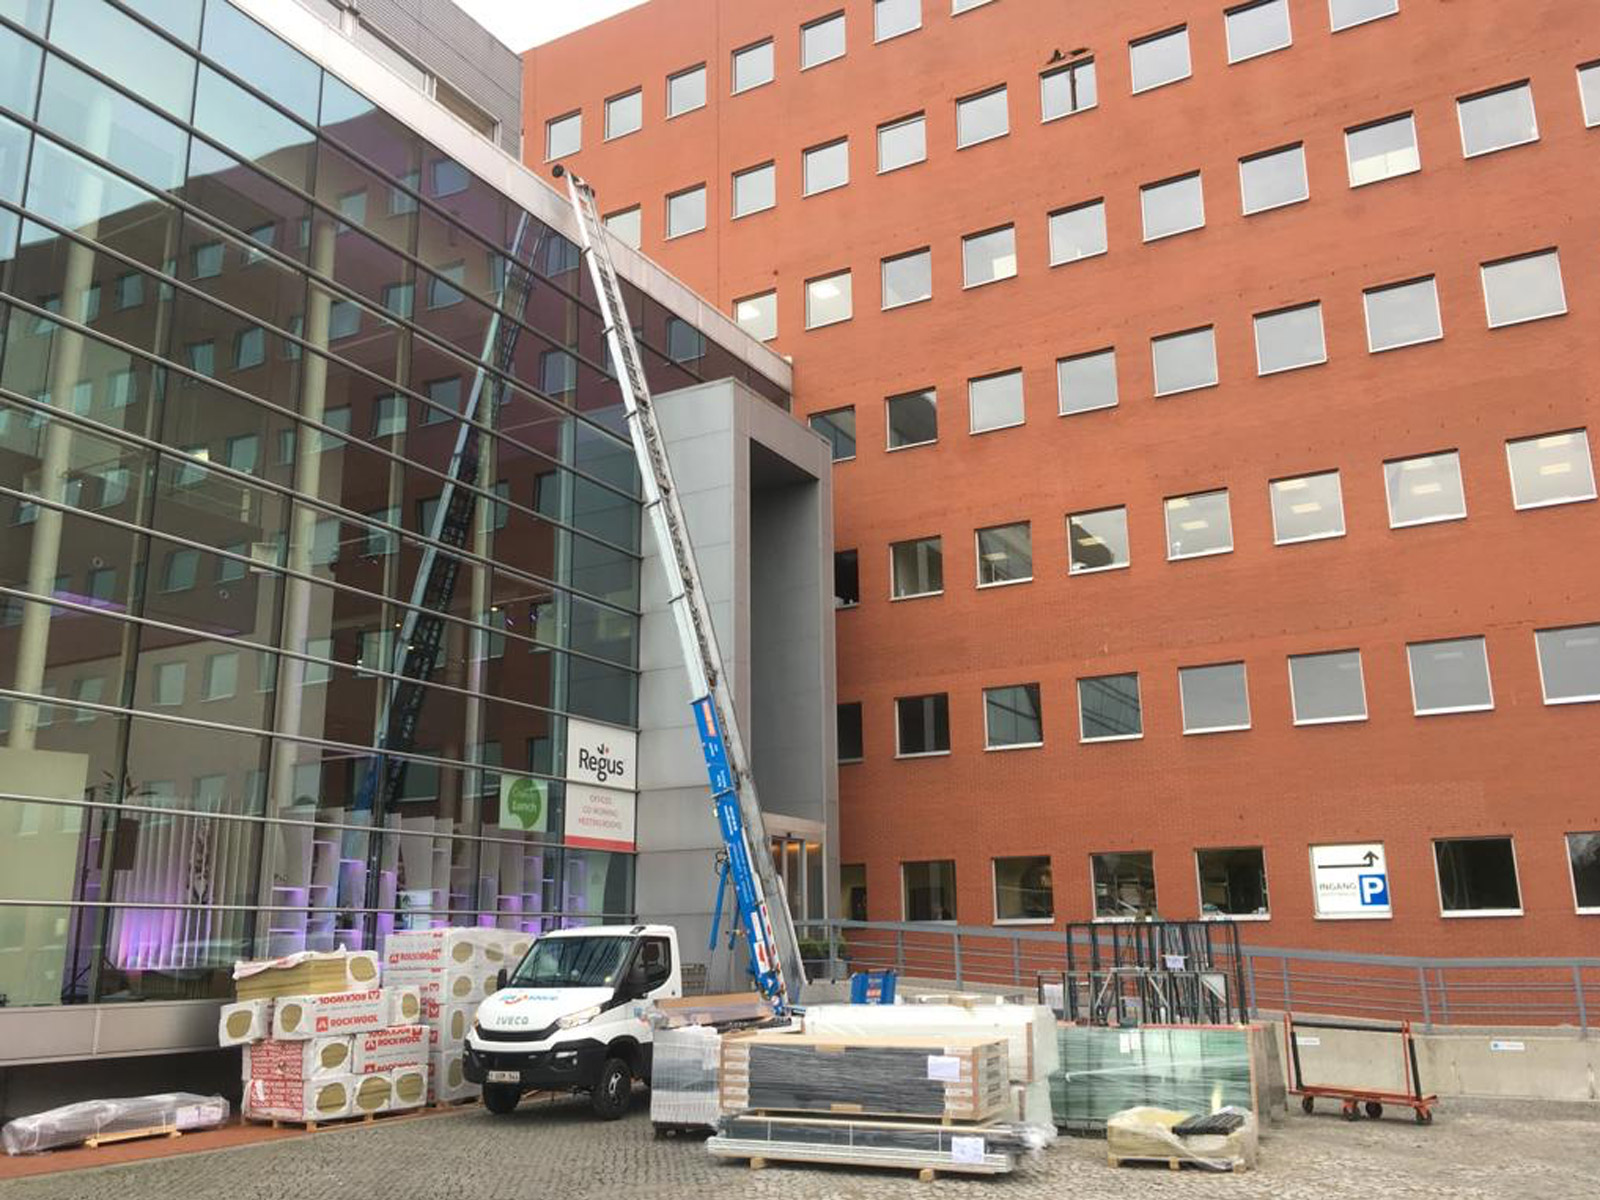 Verhuis ladderlift 31m